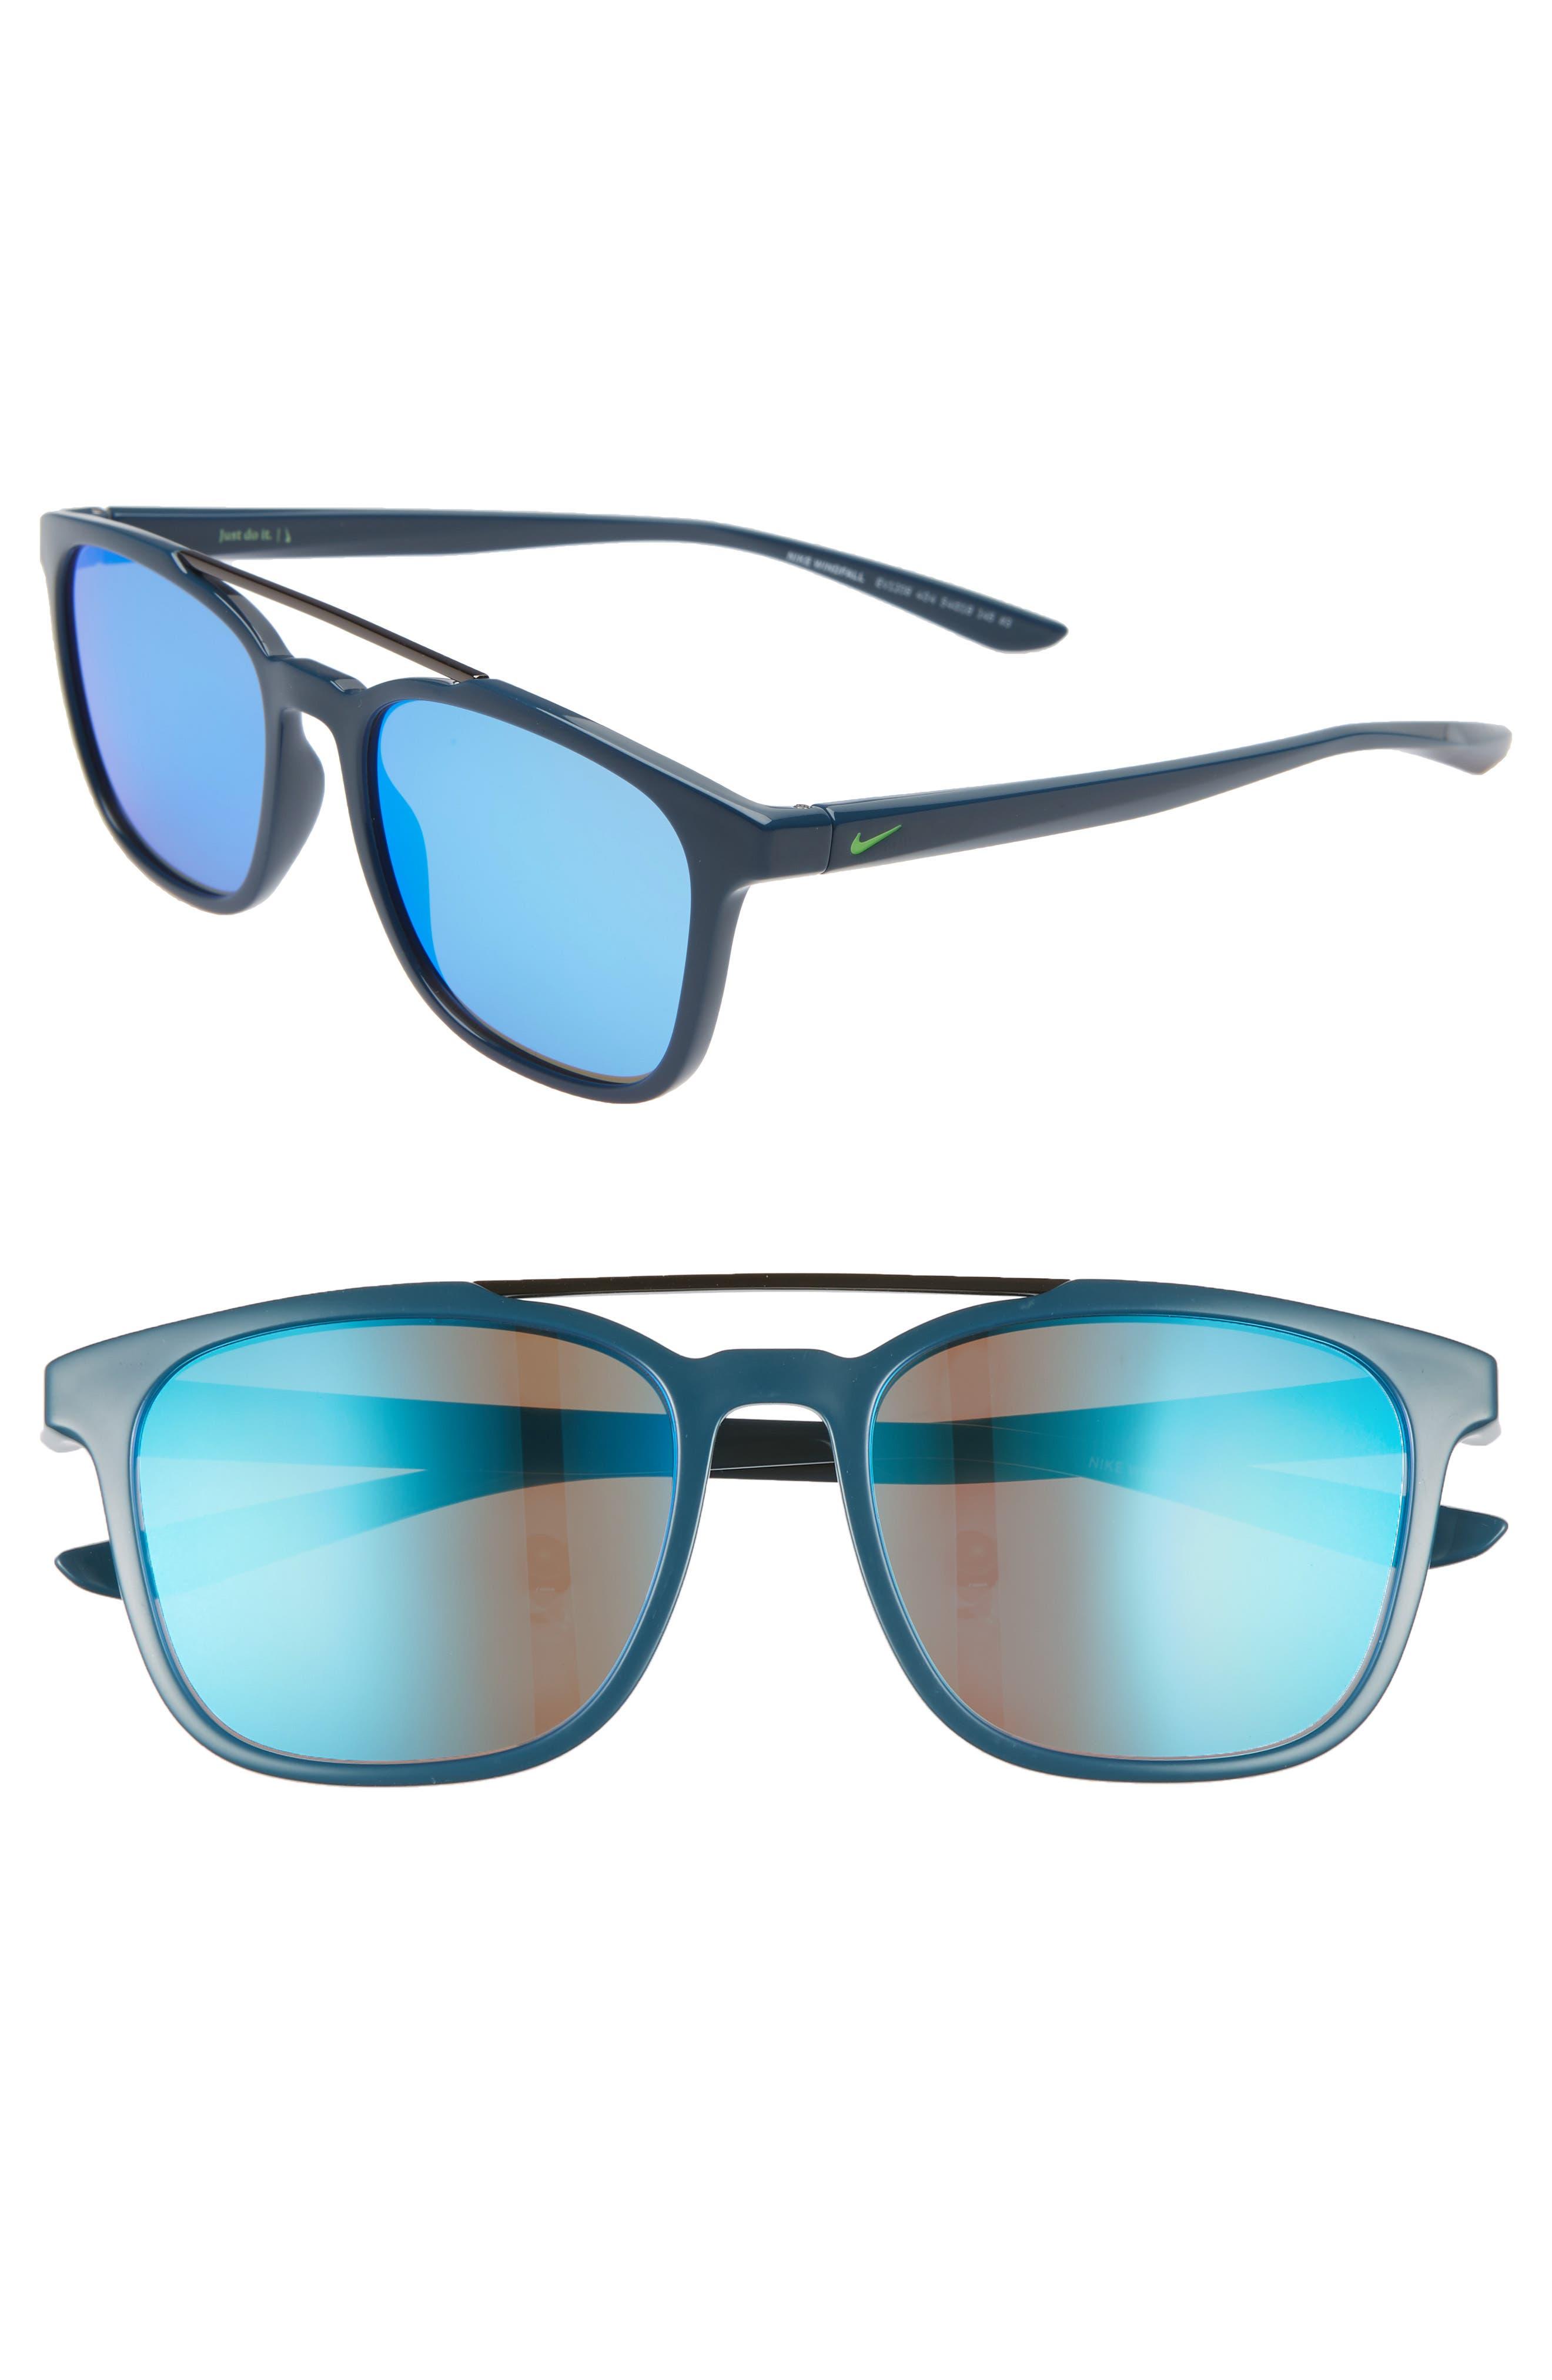 Nike Windfall 5m Square Sunglasses - Space Blue/ Blue